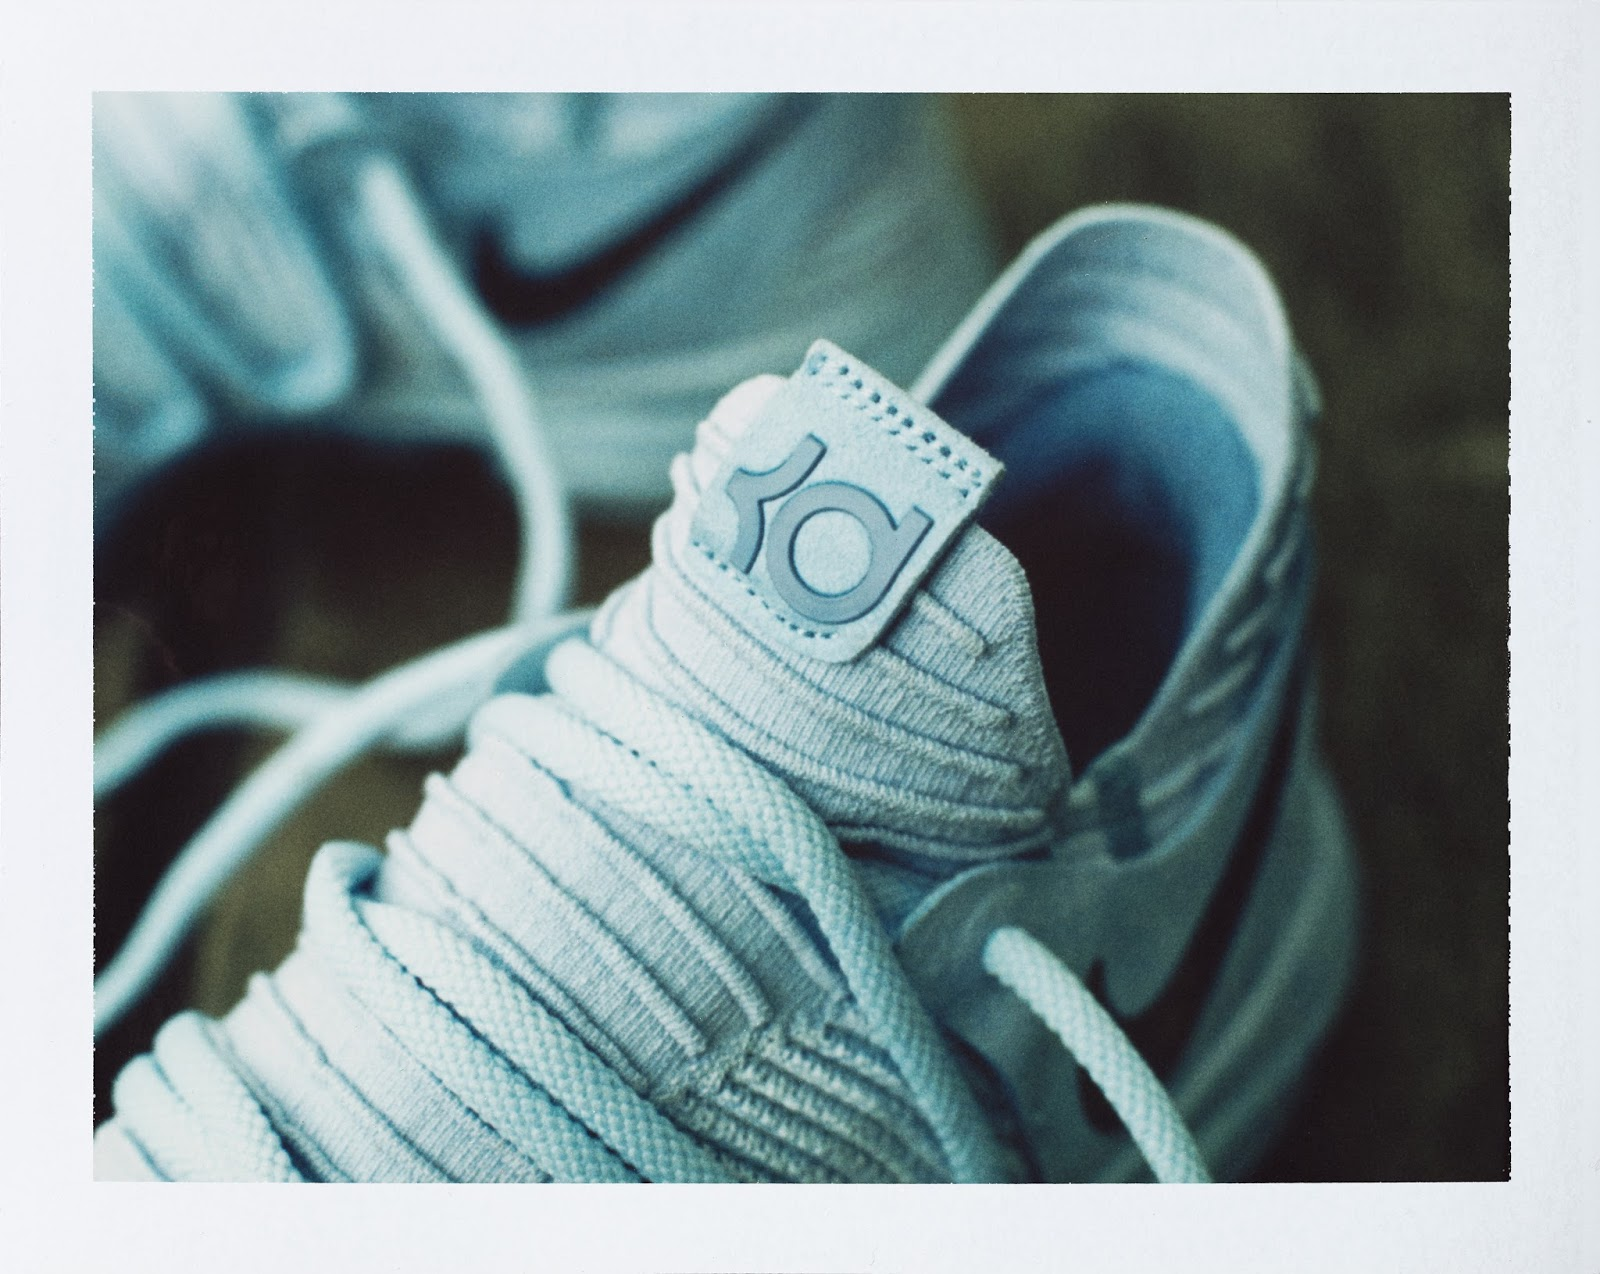 d5c12c85dd44 Nike Unveils the KD 10